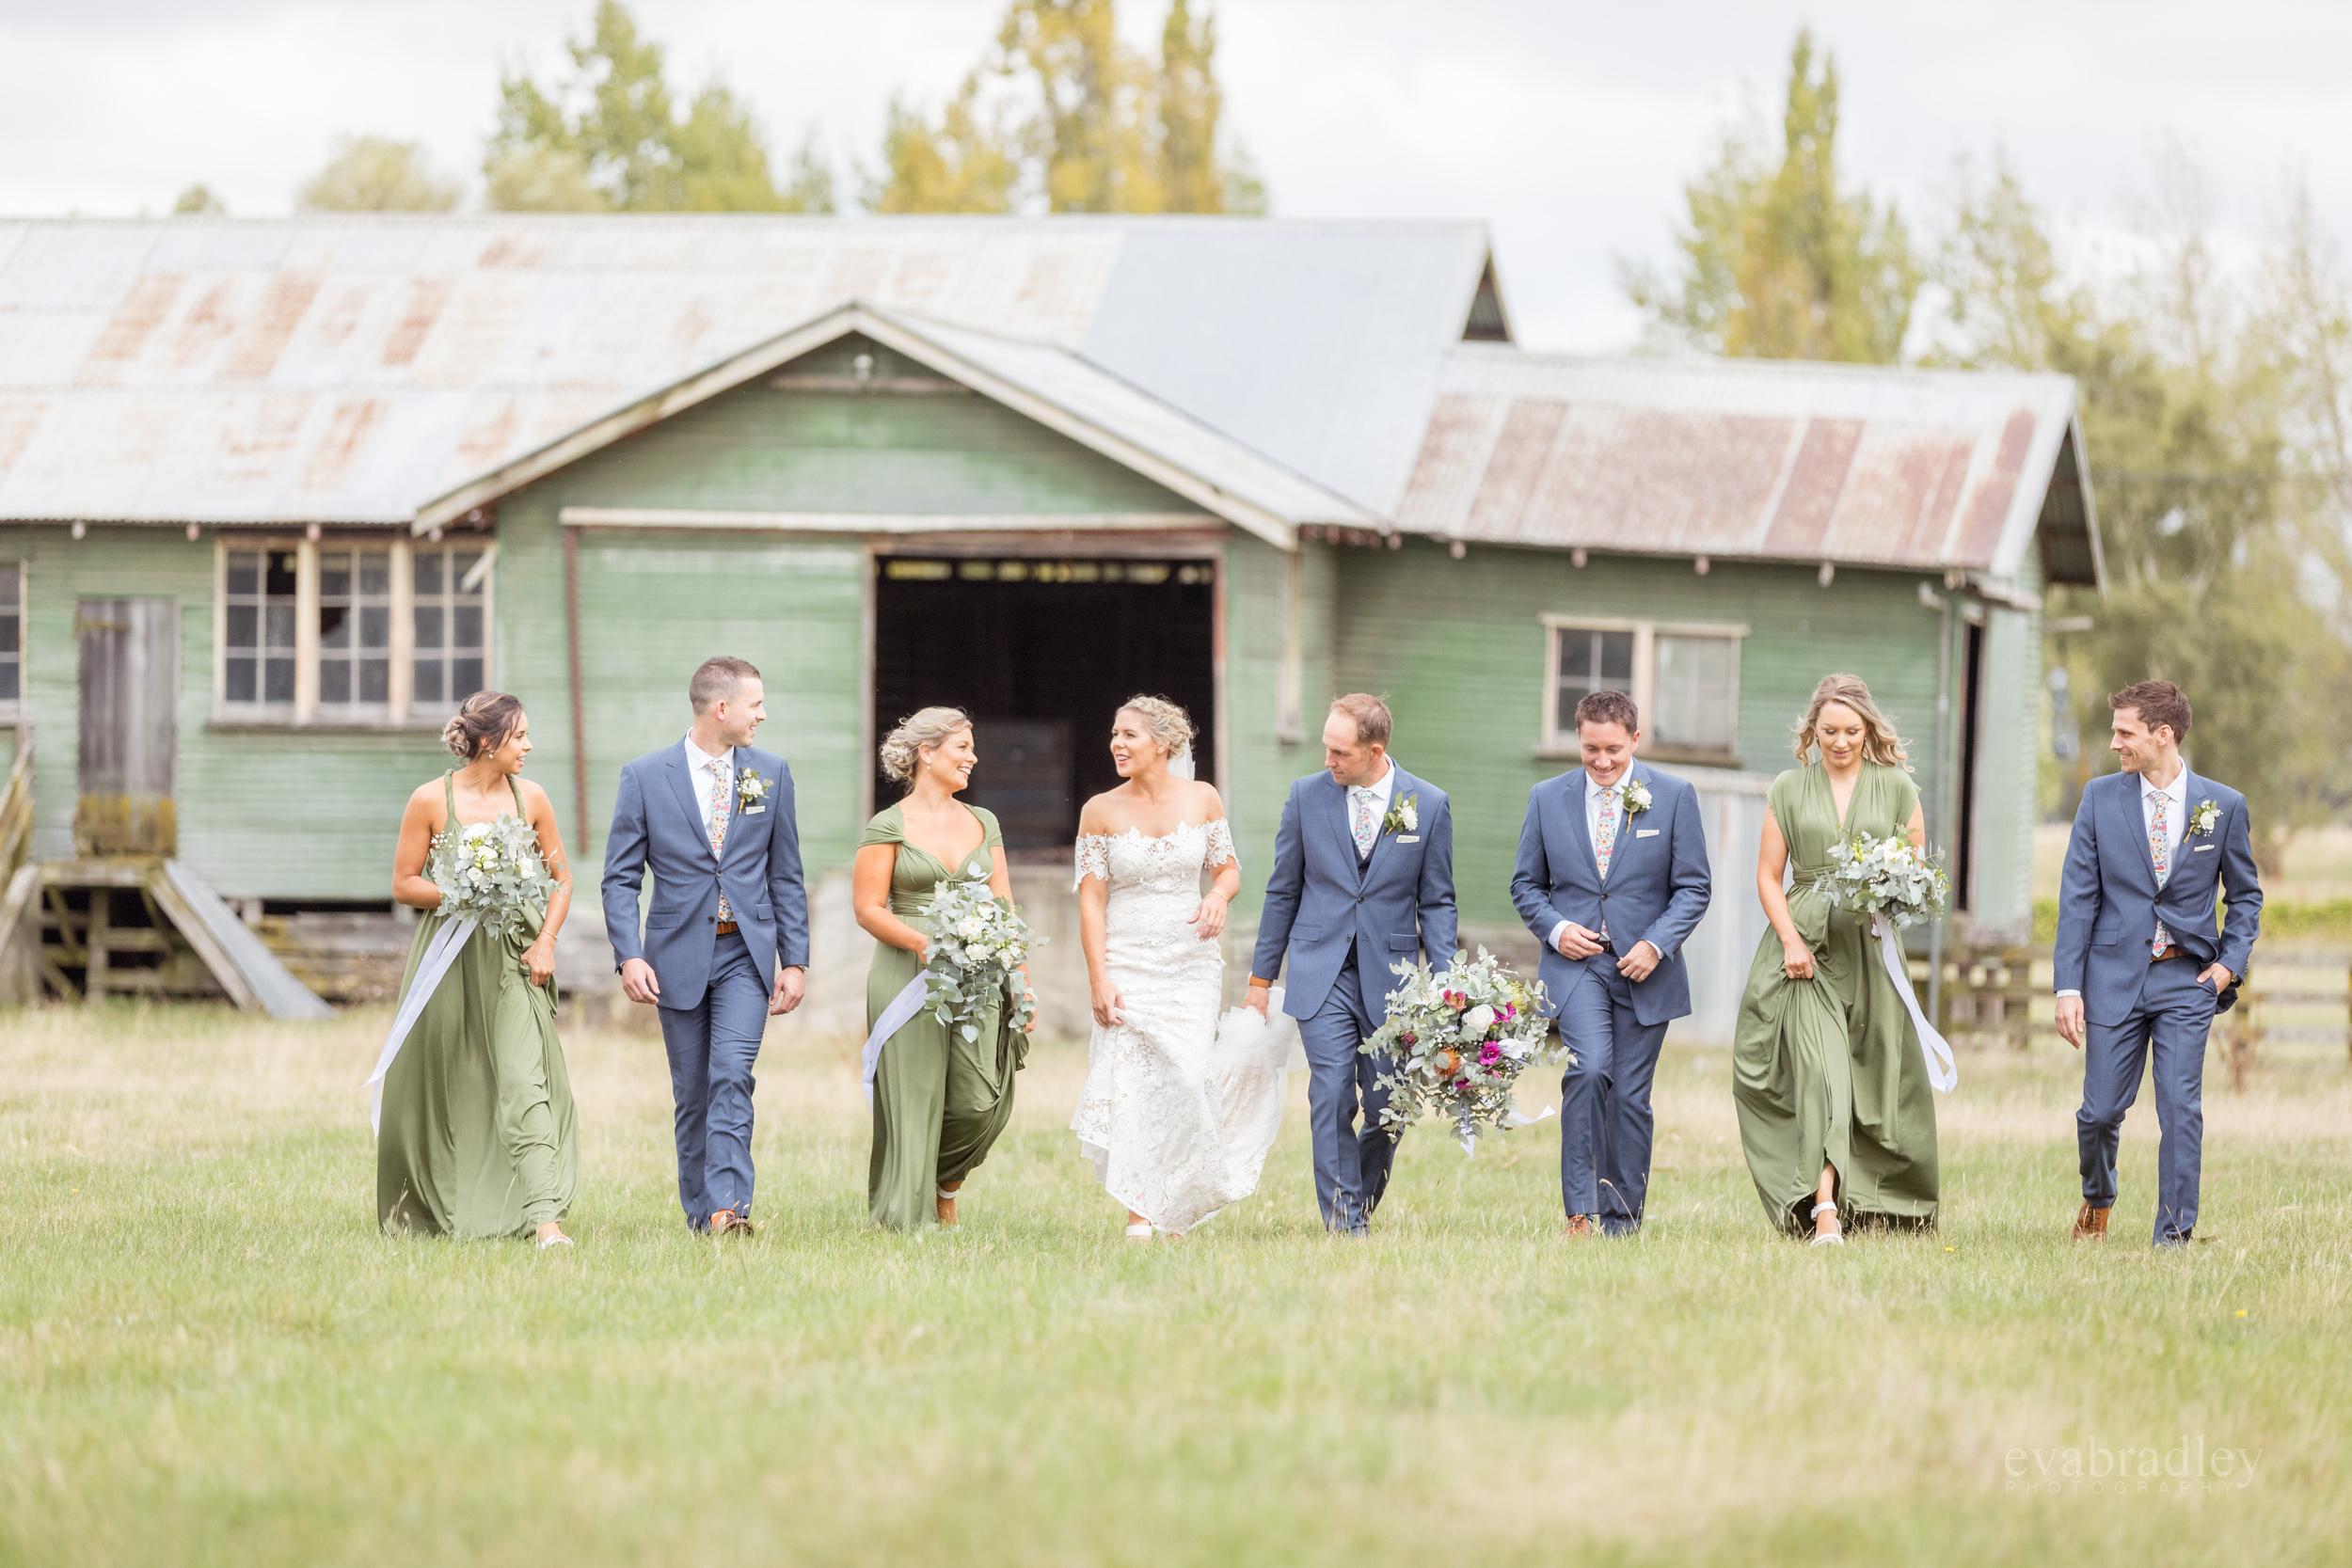 eva-bradley-andrew-caldwell-weddings